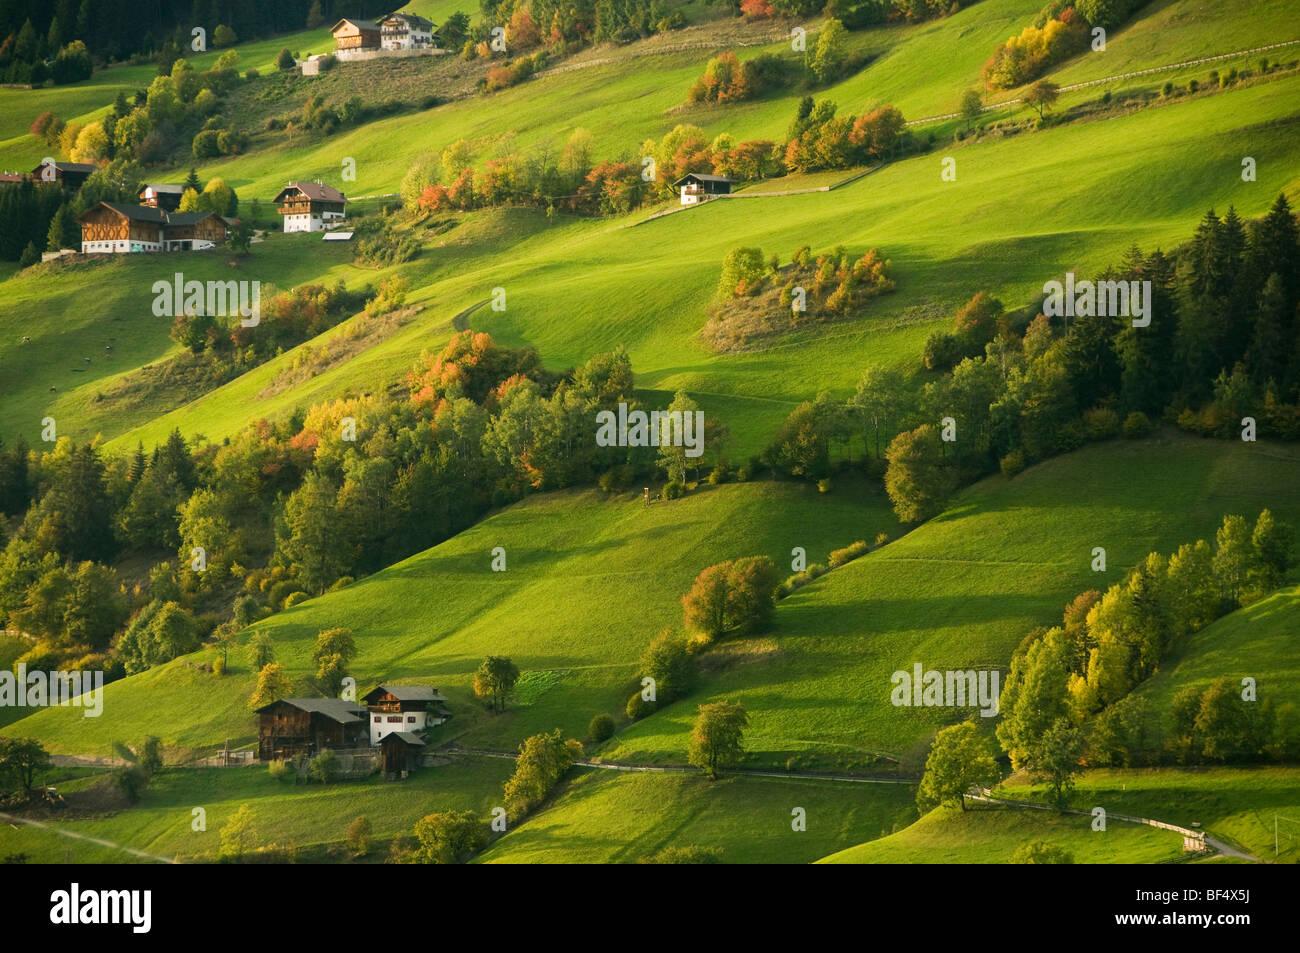 Houses and farms, Val di Funes, Dolomites, Trentino-Alto Adige, Italy - Stock Image